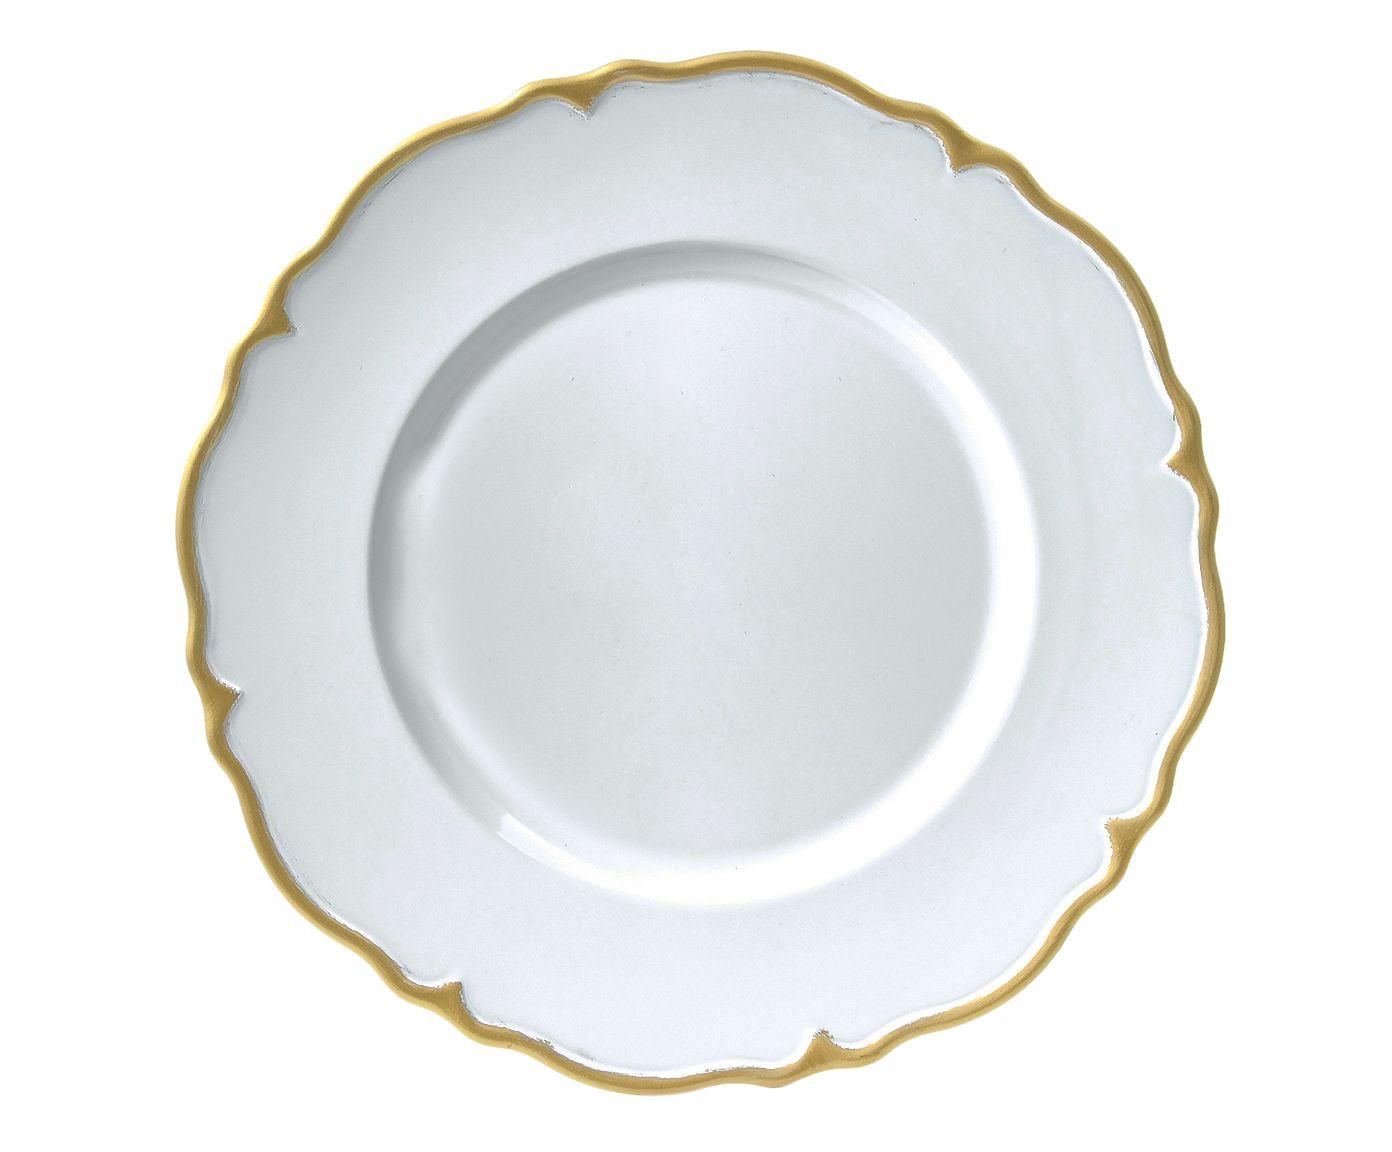 Sousplat Marselha White - 33cm | Westwing.com.br